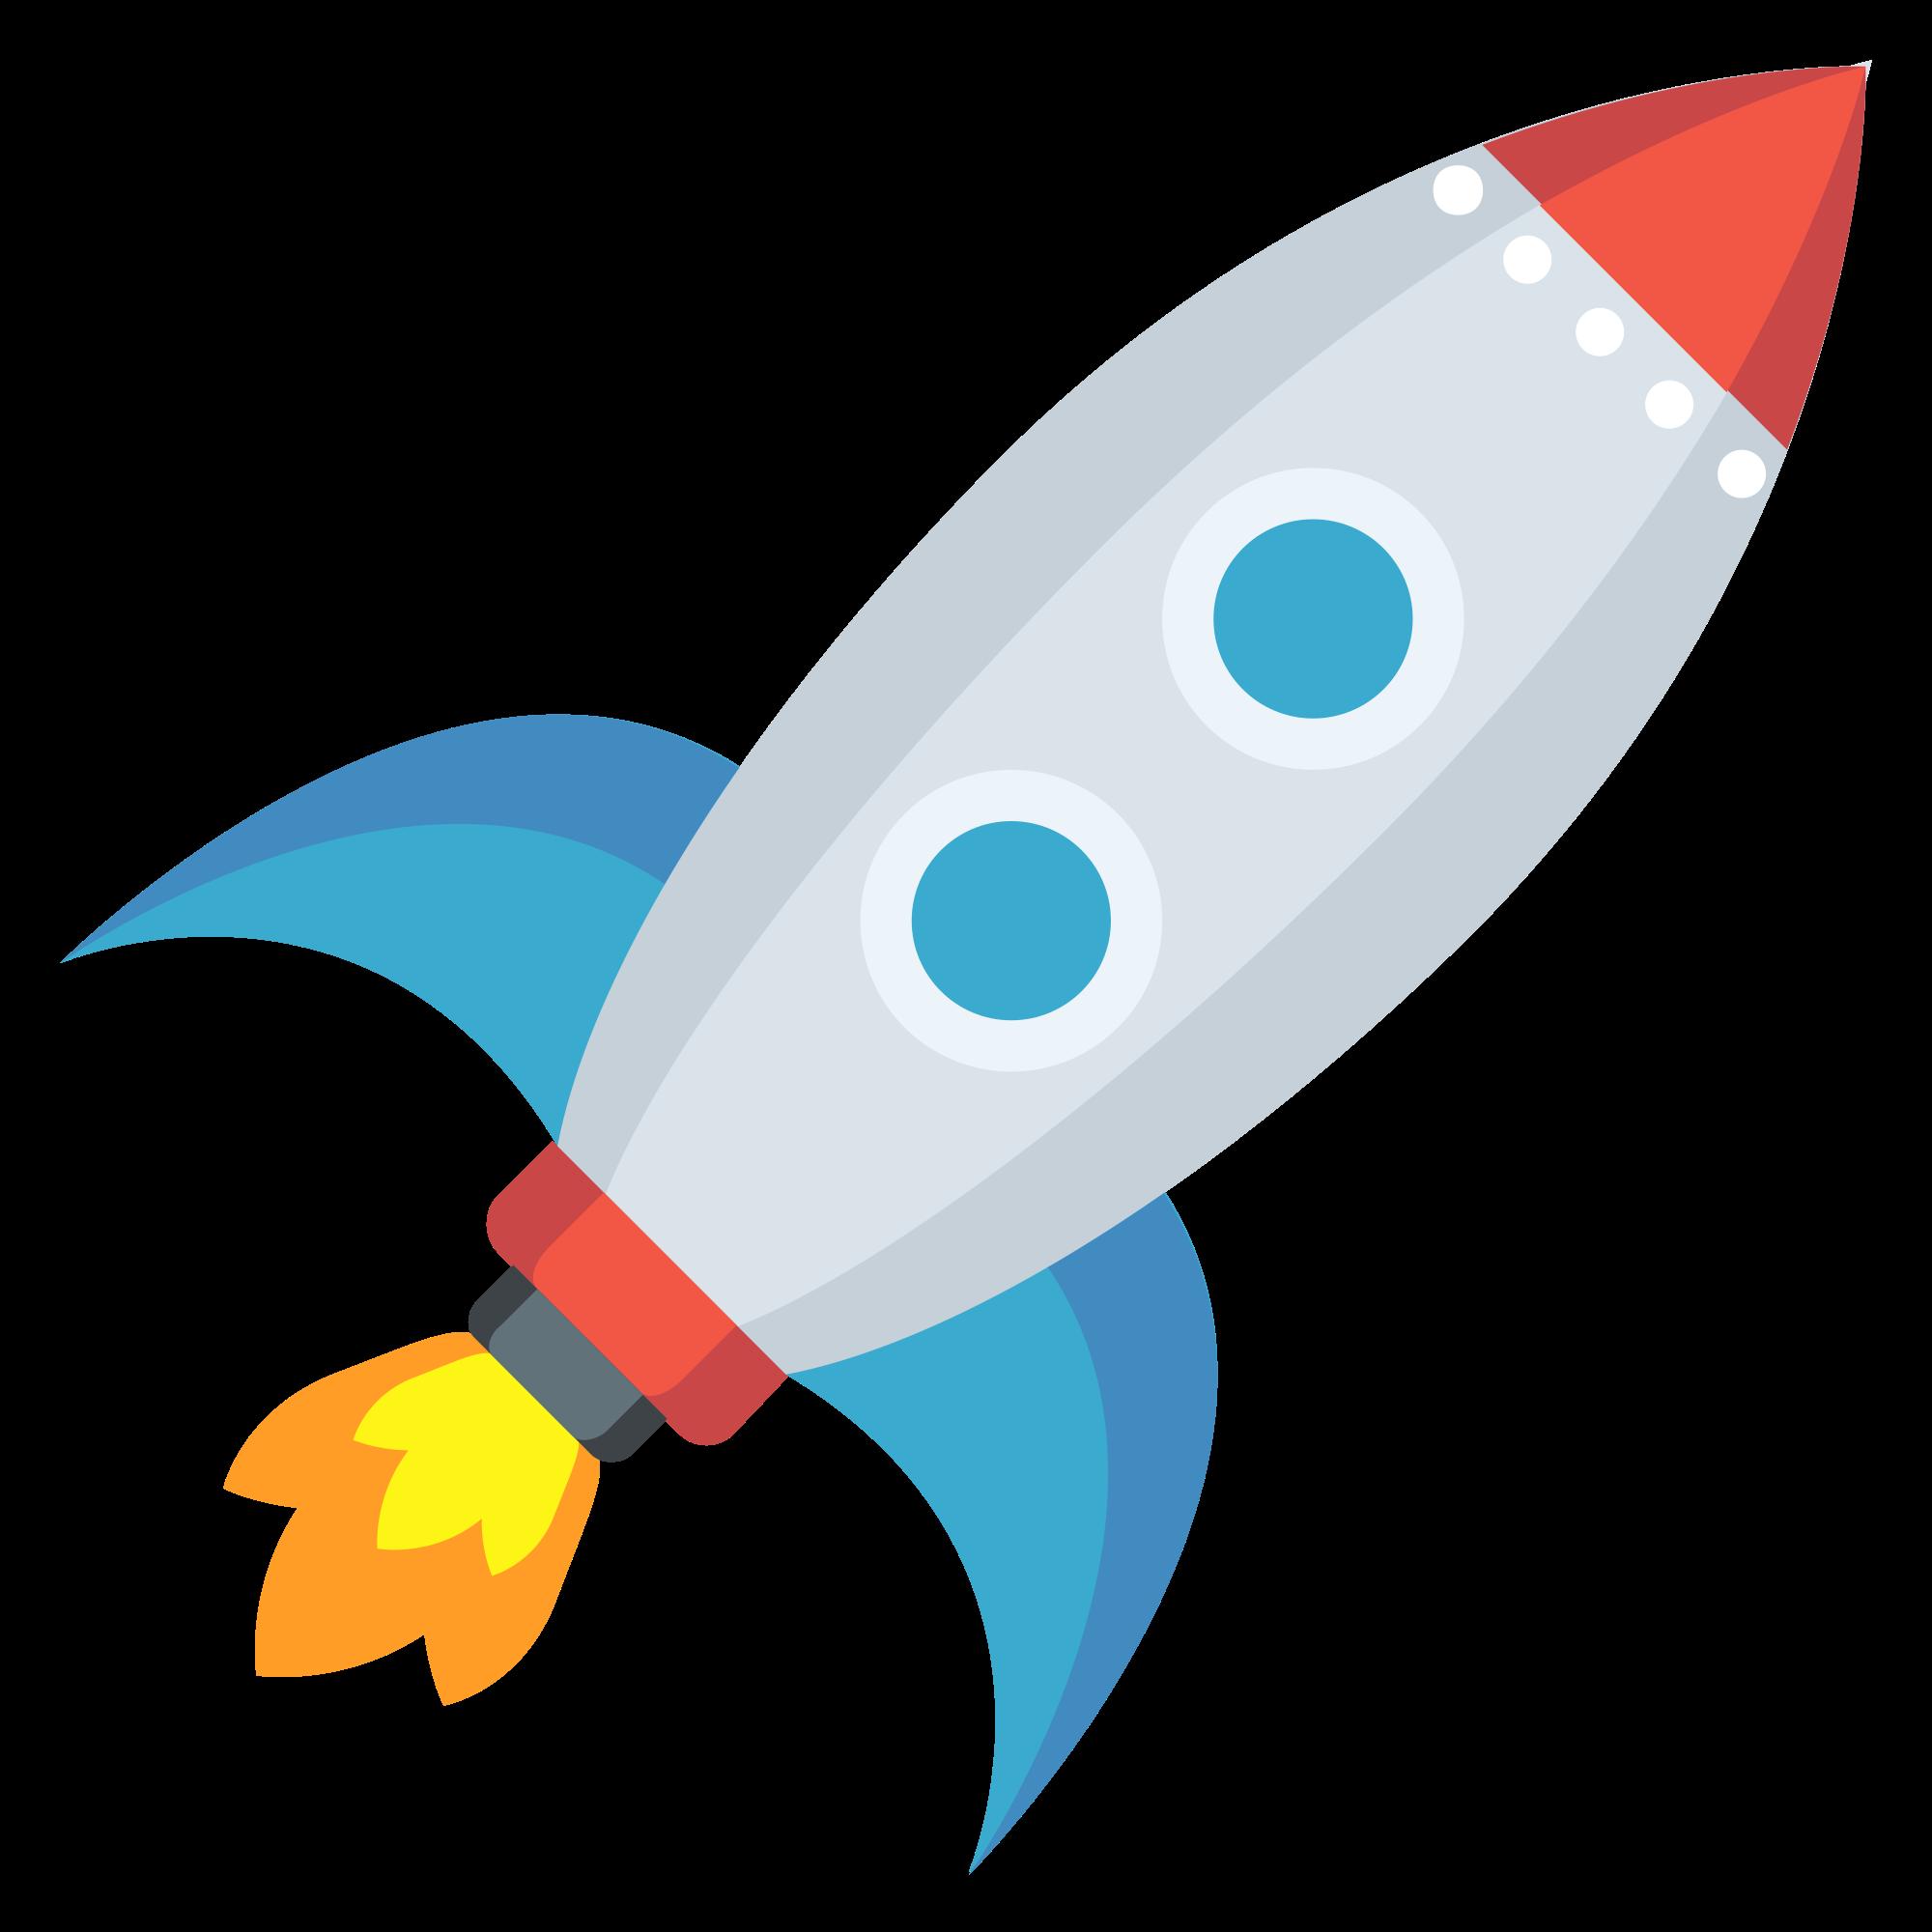 Clipart rocket emoji. File emojione f svg